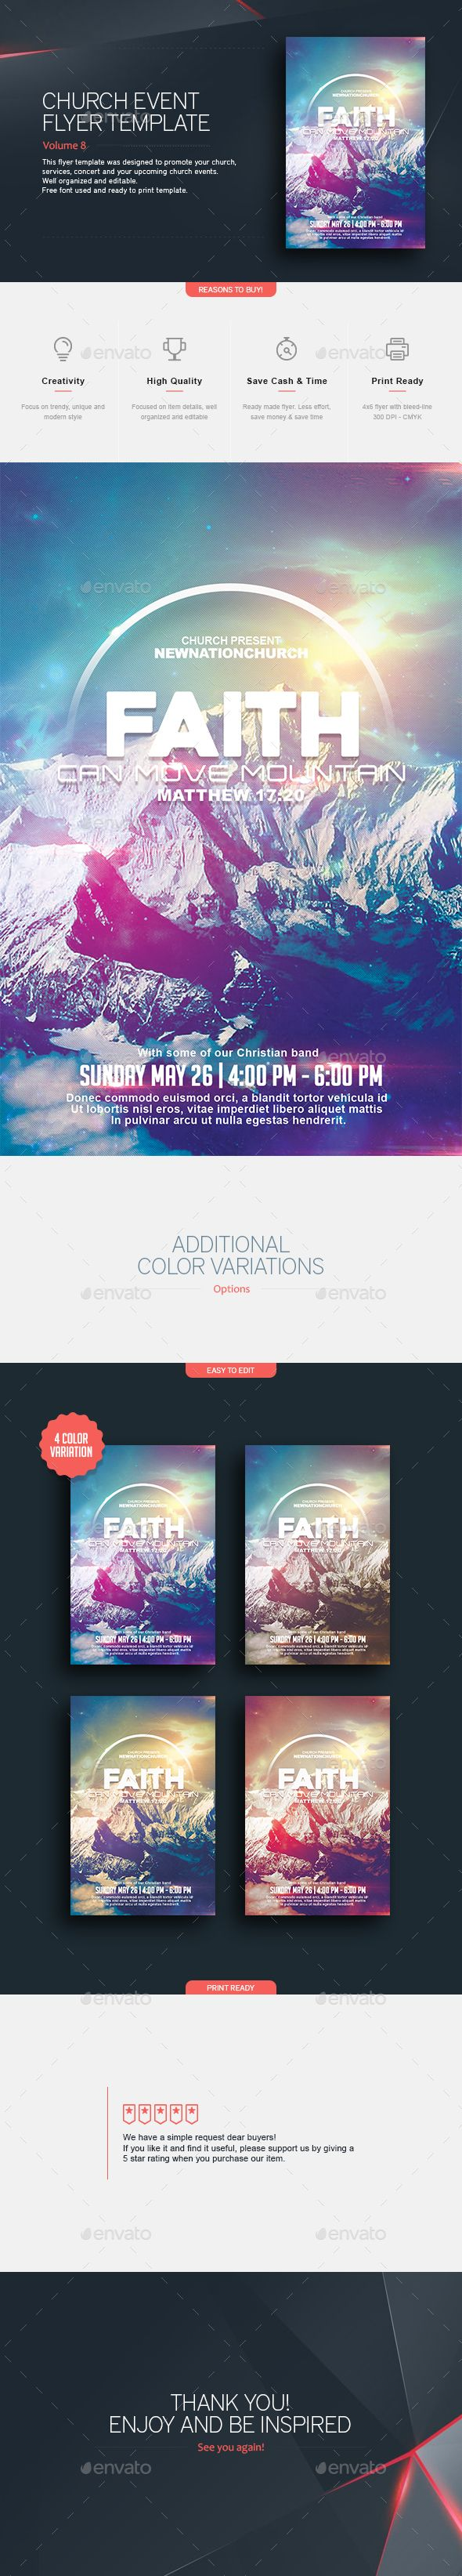 8 best church images on pinterest church graphic design flyer